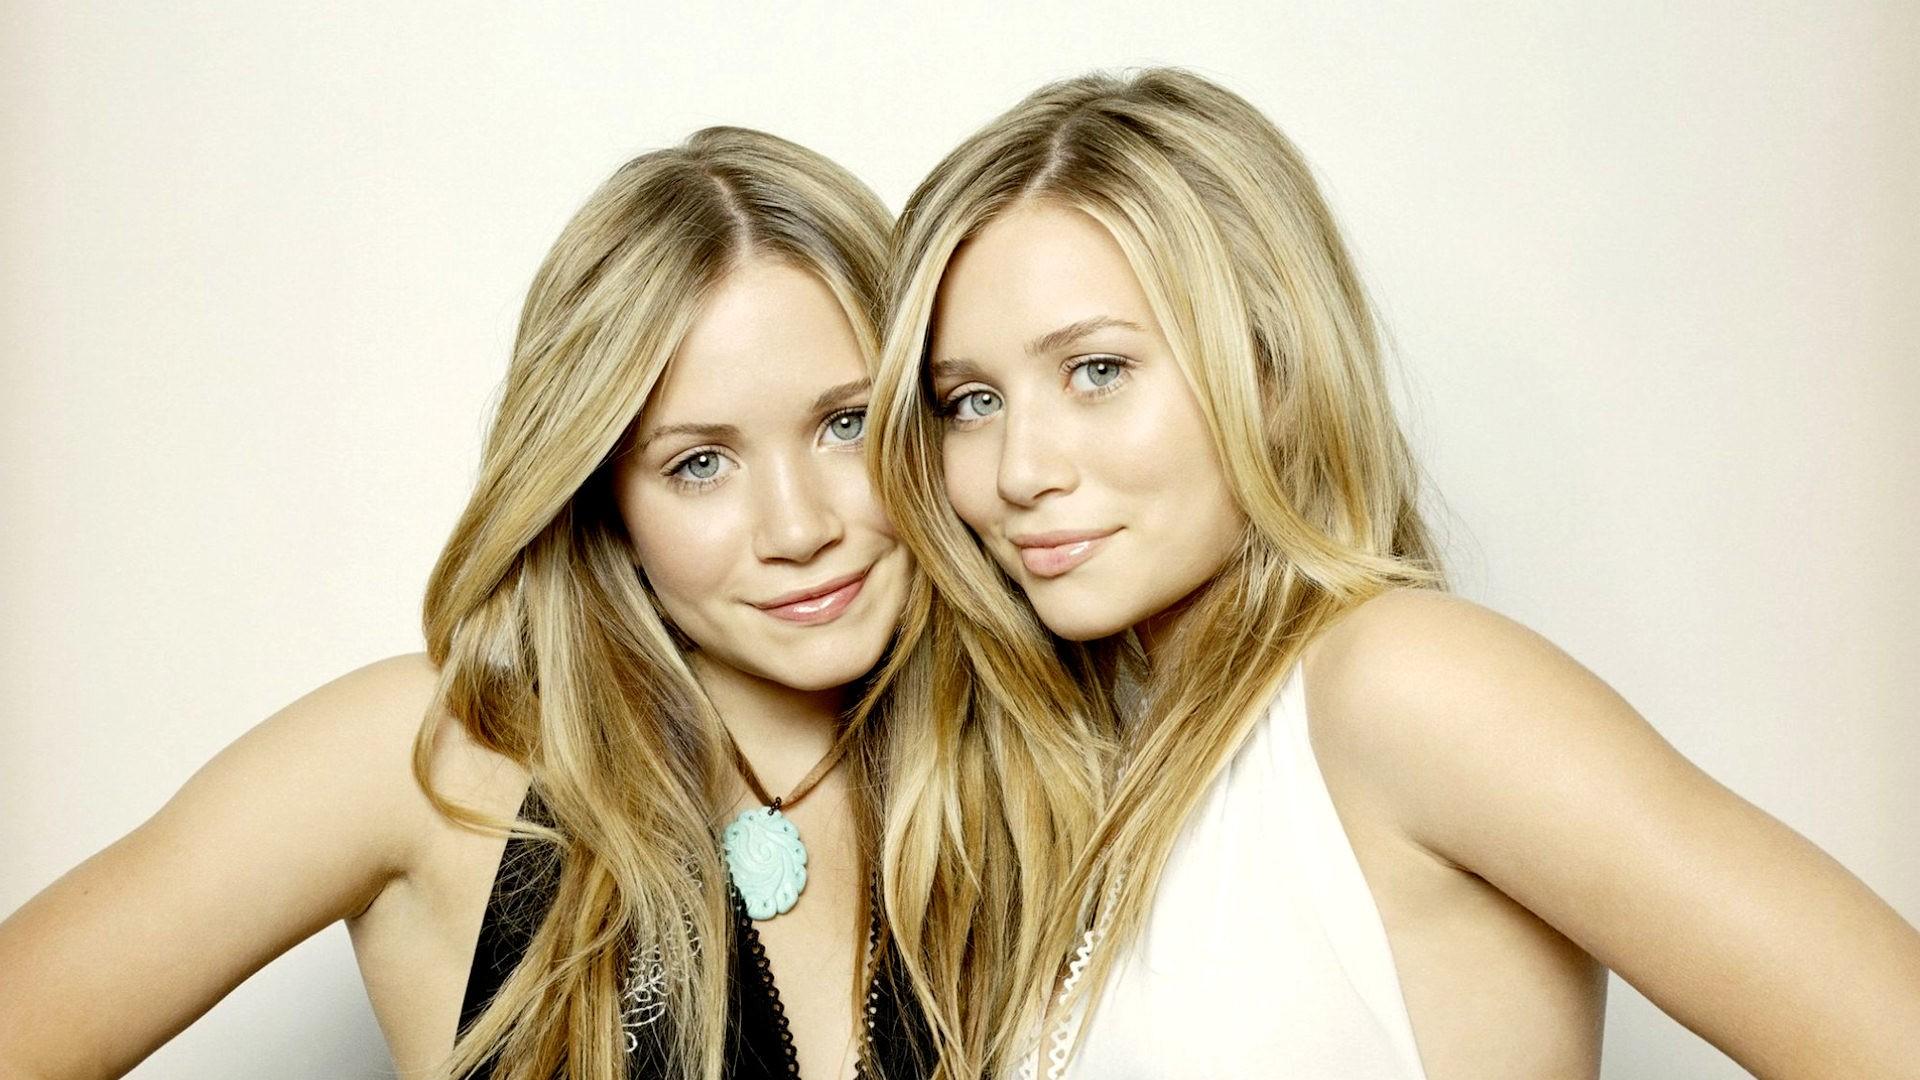 Olsen Twins 2014   wallpaper 1920x1080